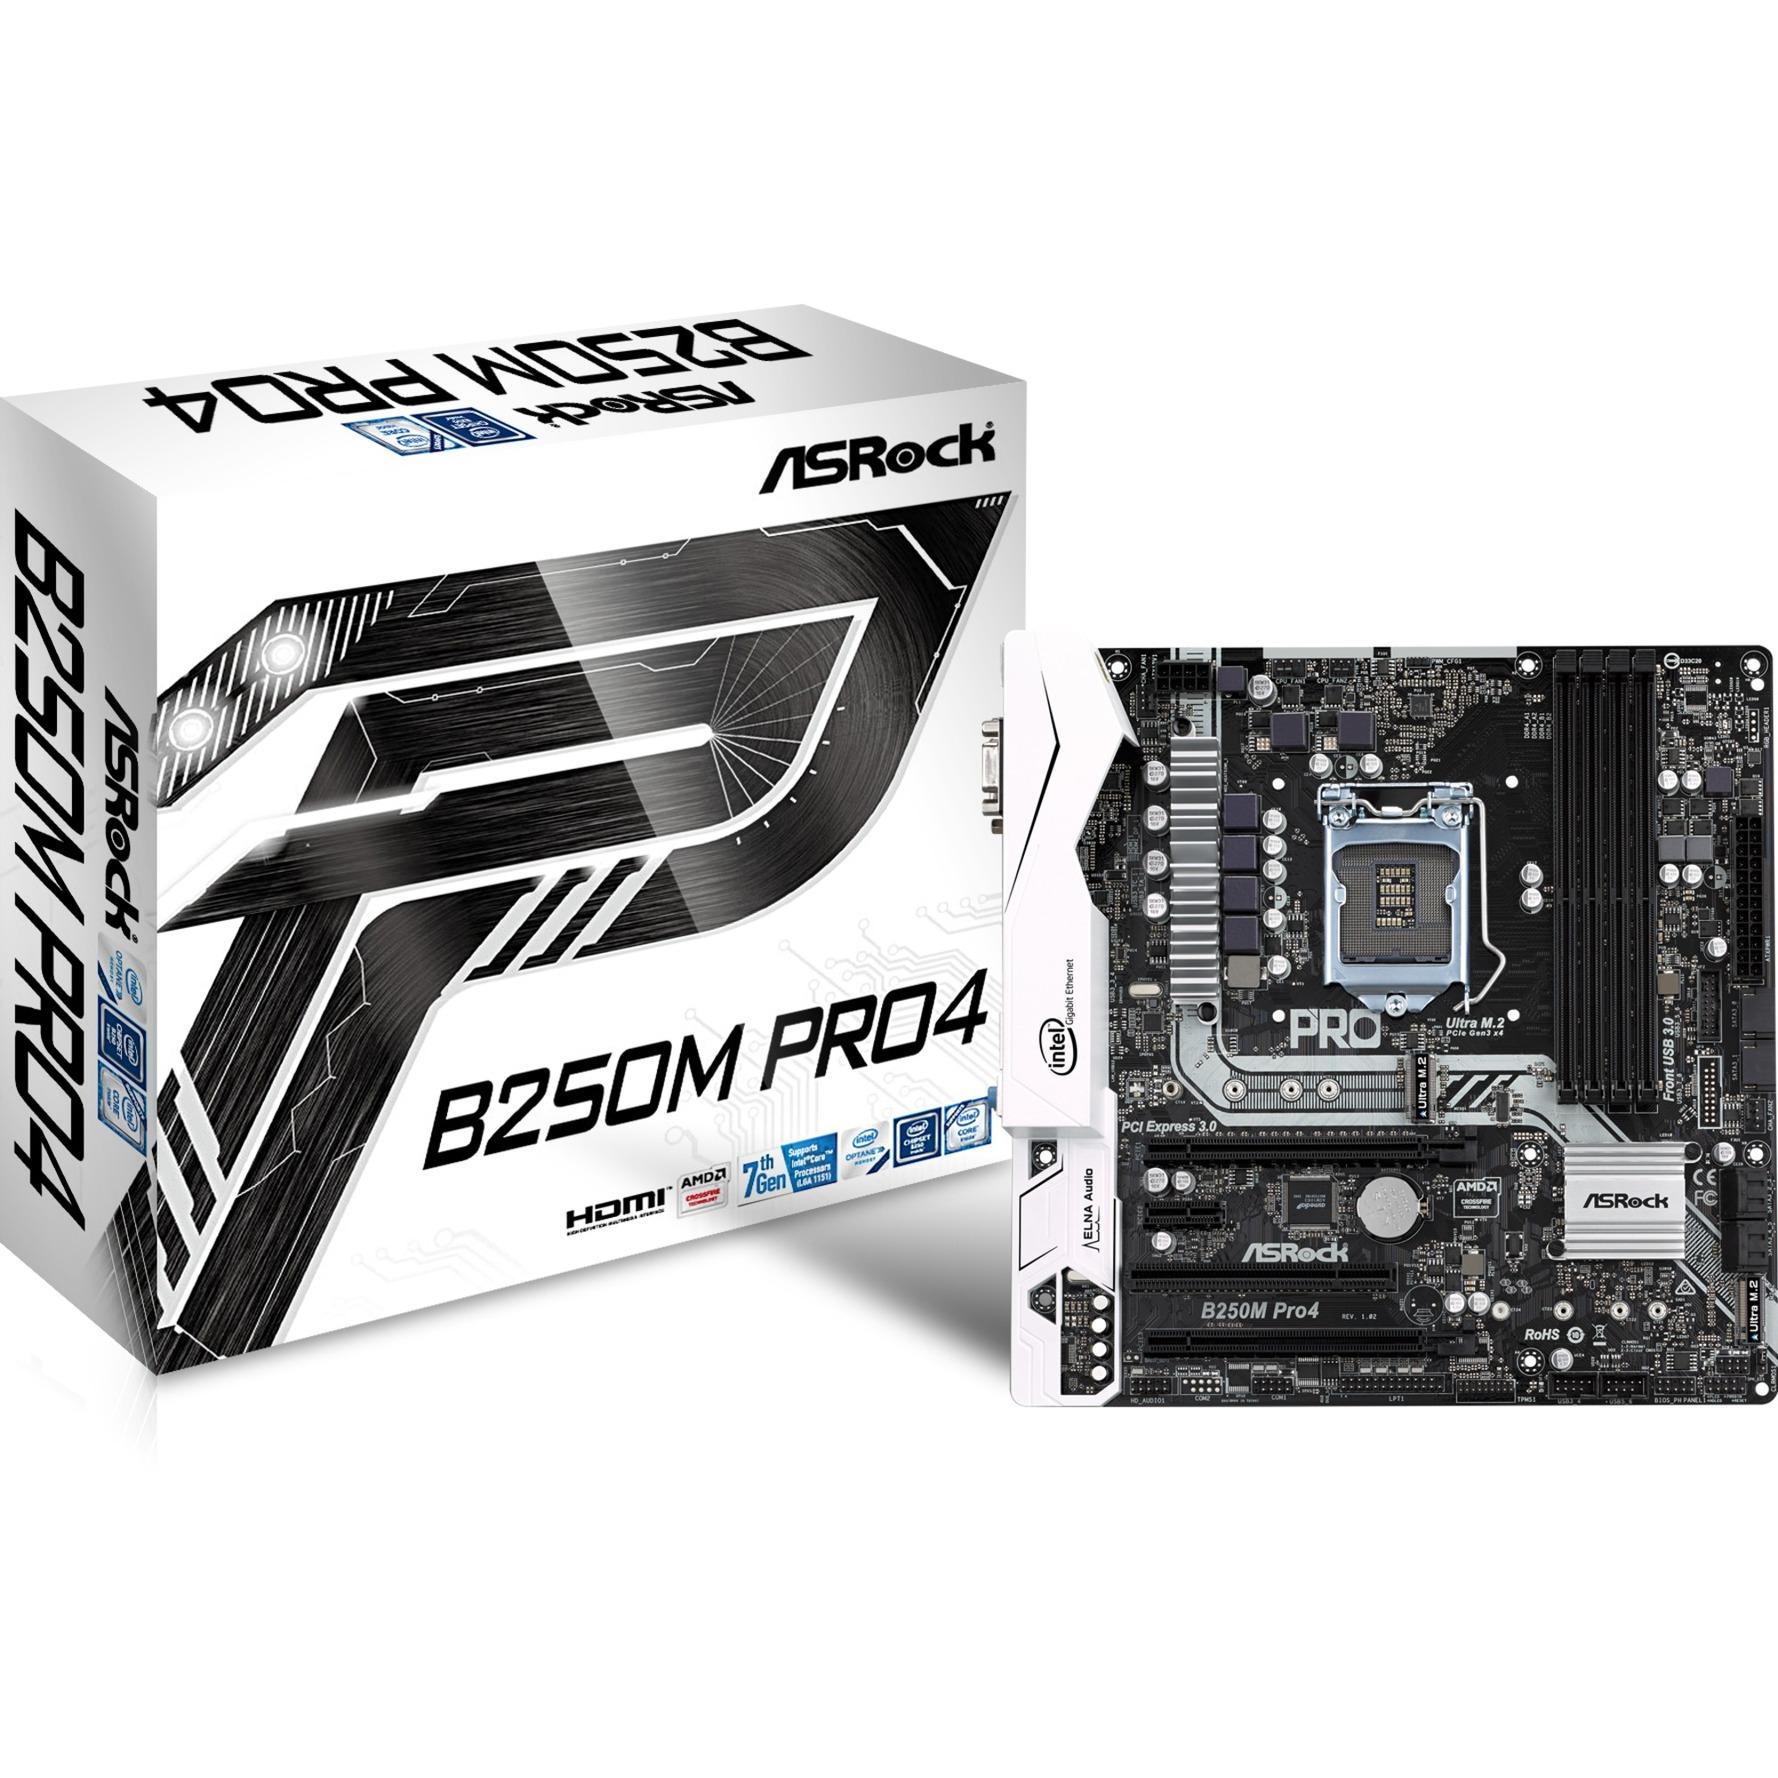 B250M Pro4 Intel B250 LGA 1151 (Zócalo H4) Micro ATX, Placa base